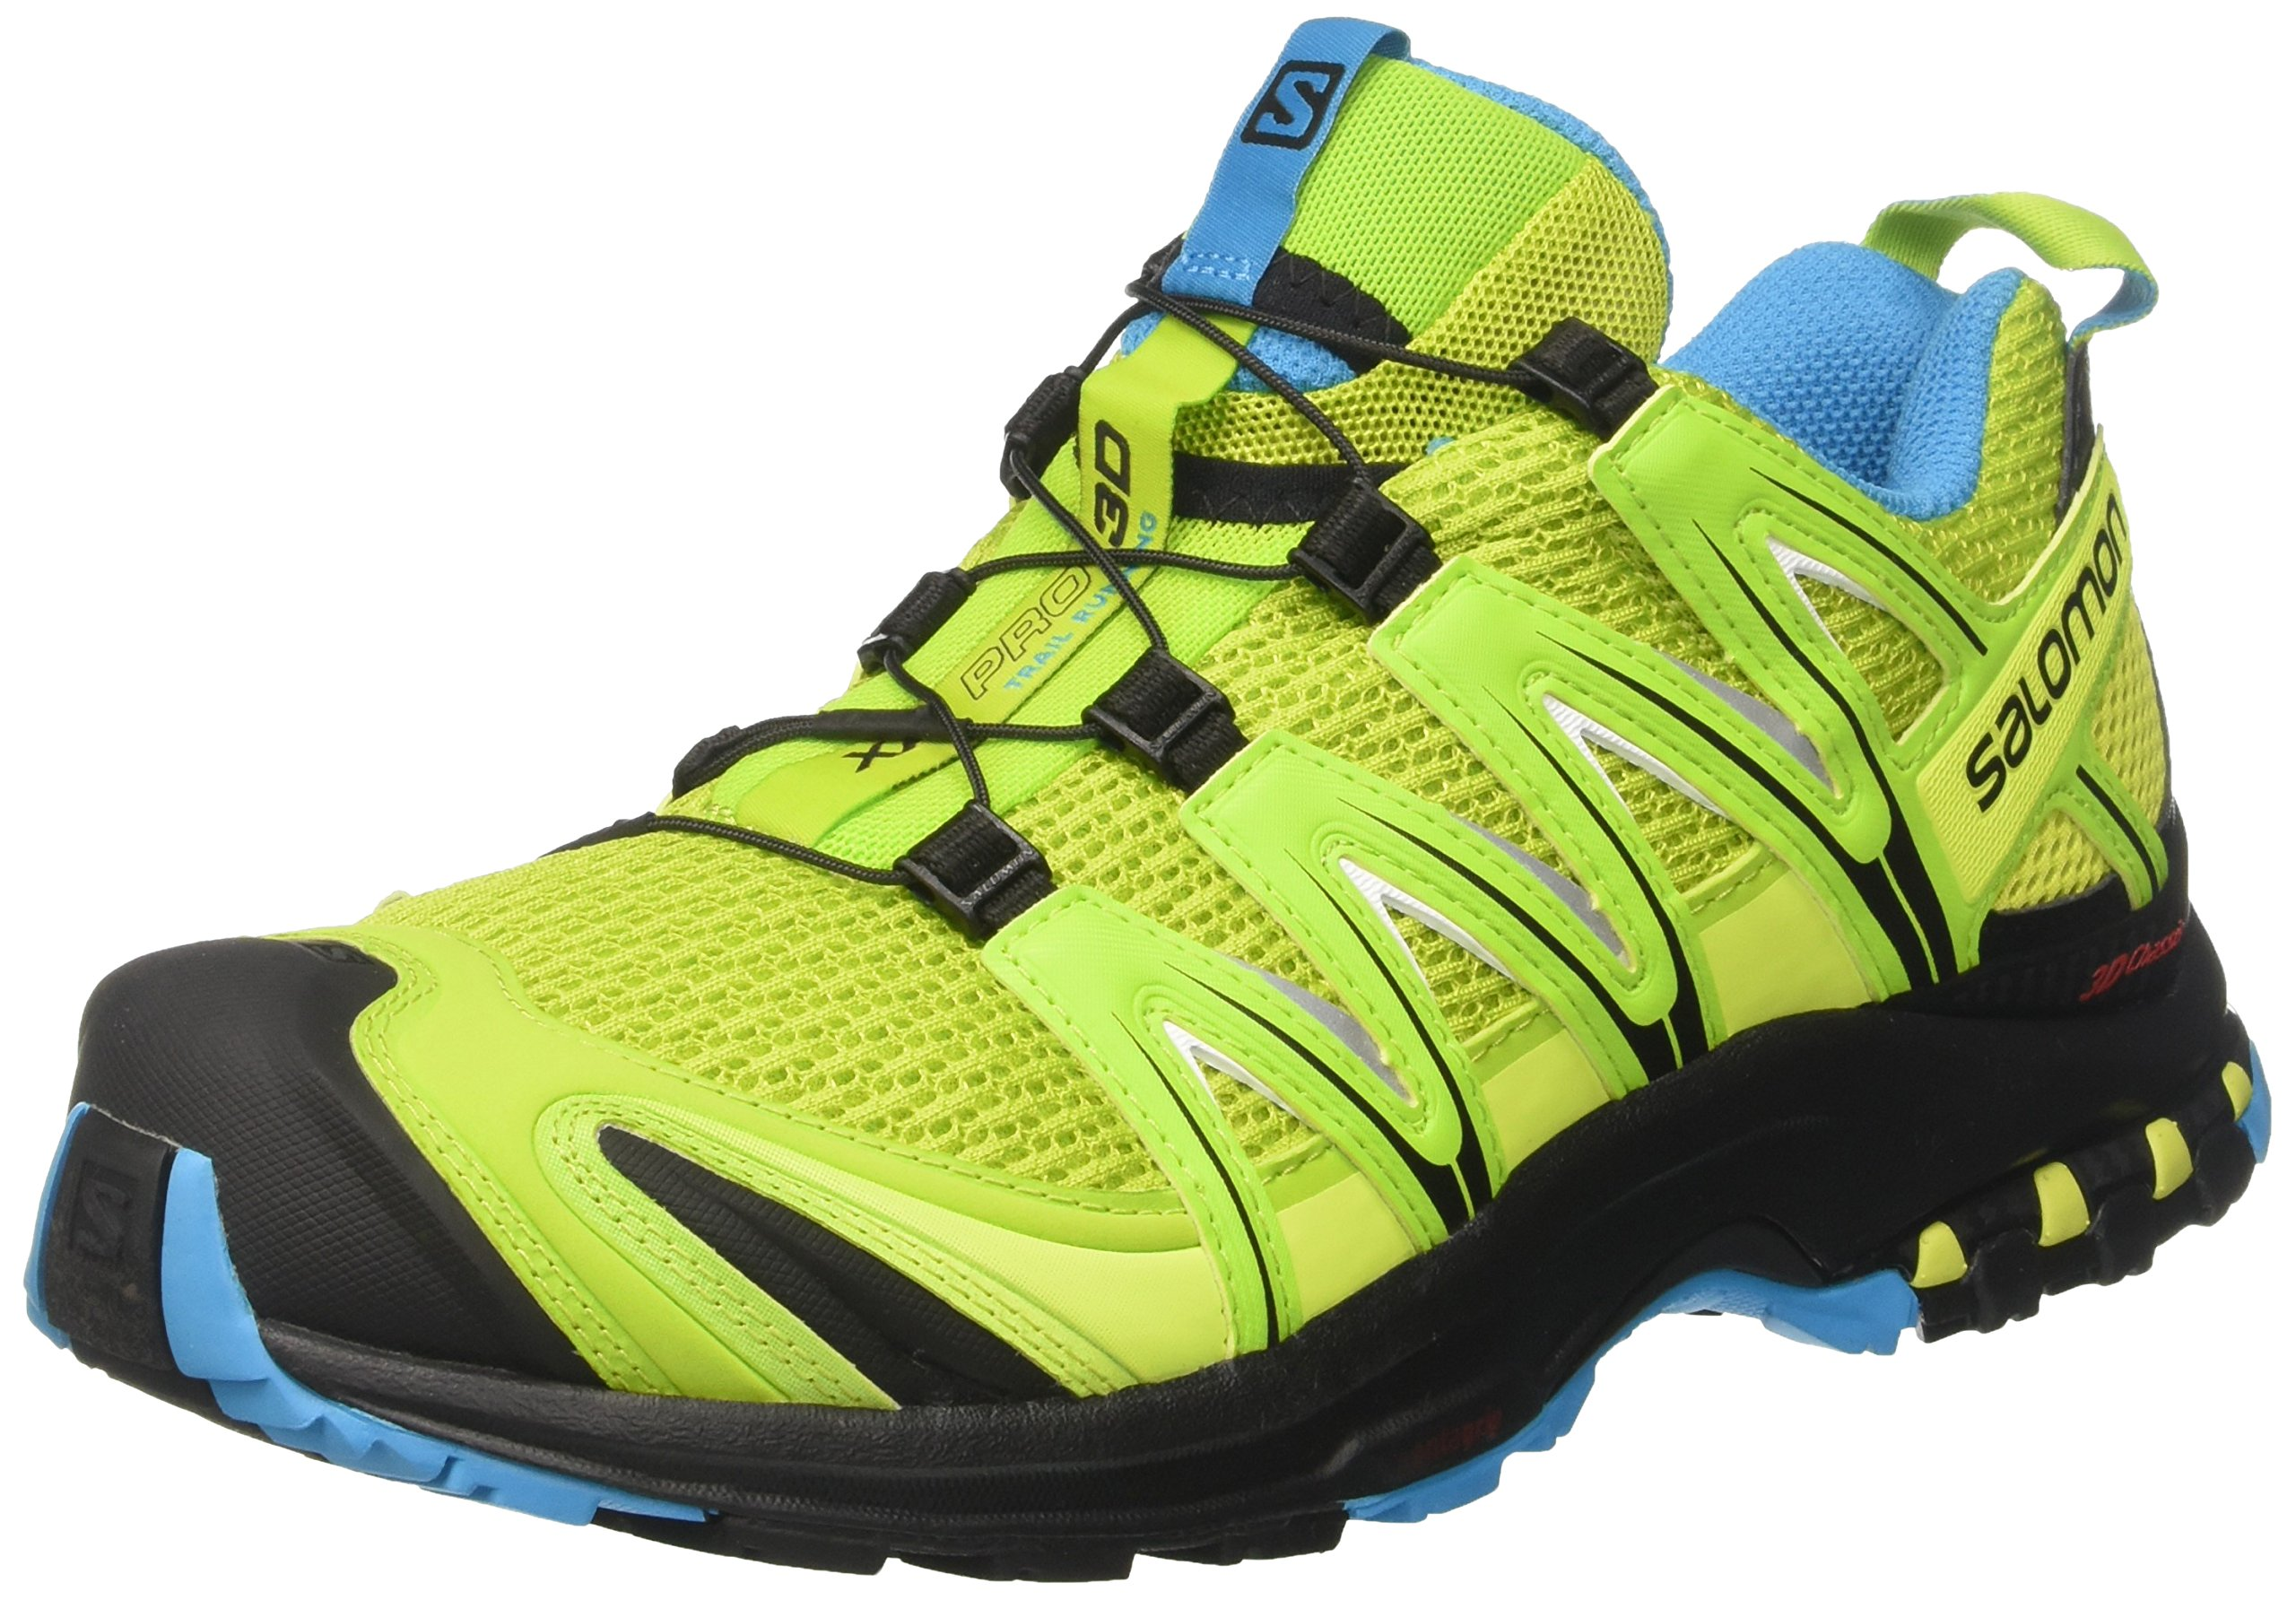 Salomon Men's XA Pro 3D Trail Running Shoe (8.5 D(M) US, Lime Green/Hawaiian/Black)